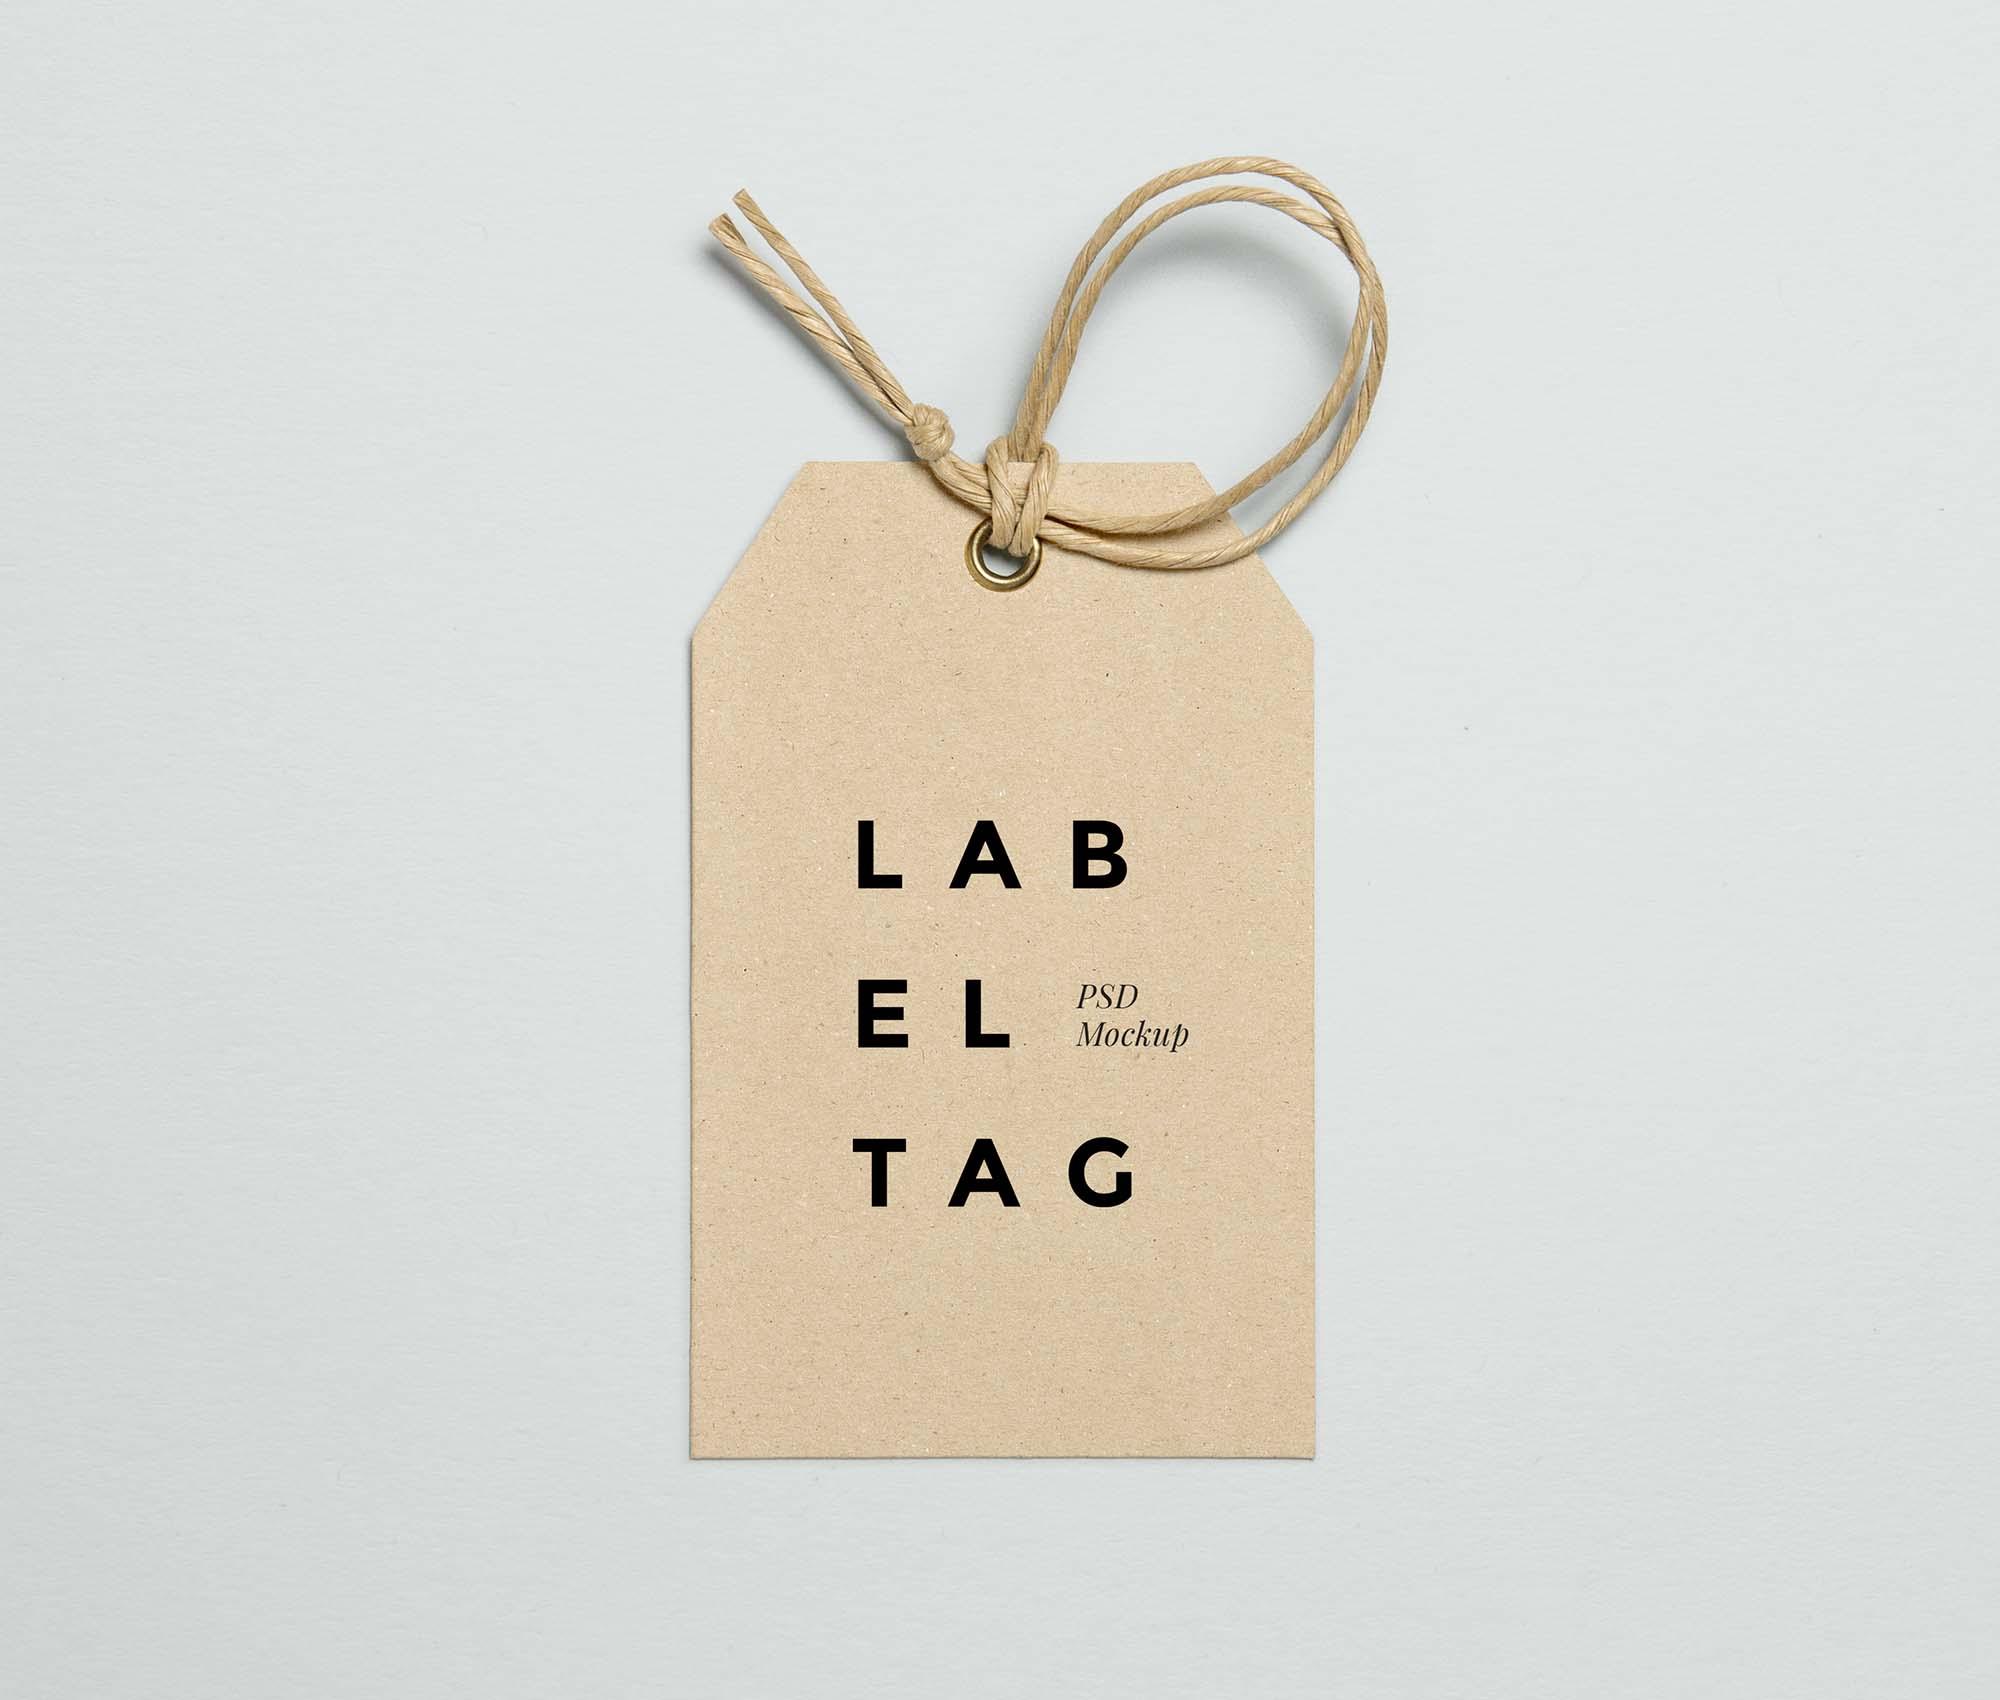 Label Tag Mockup 2